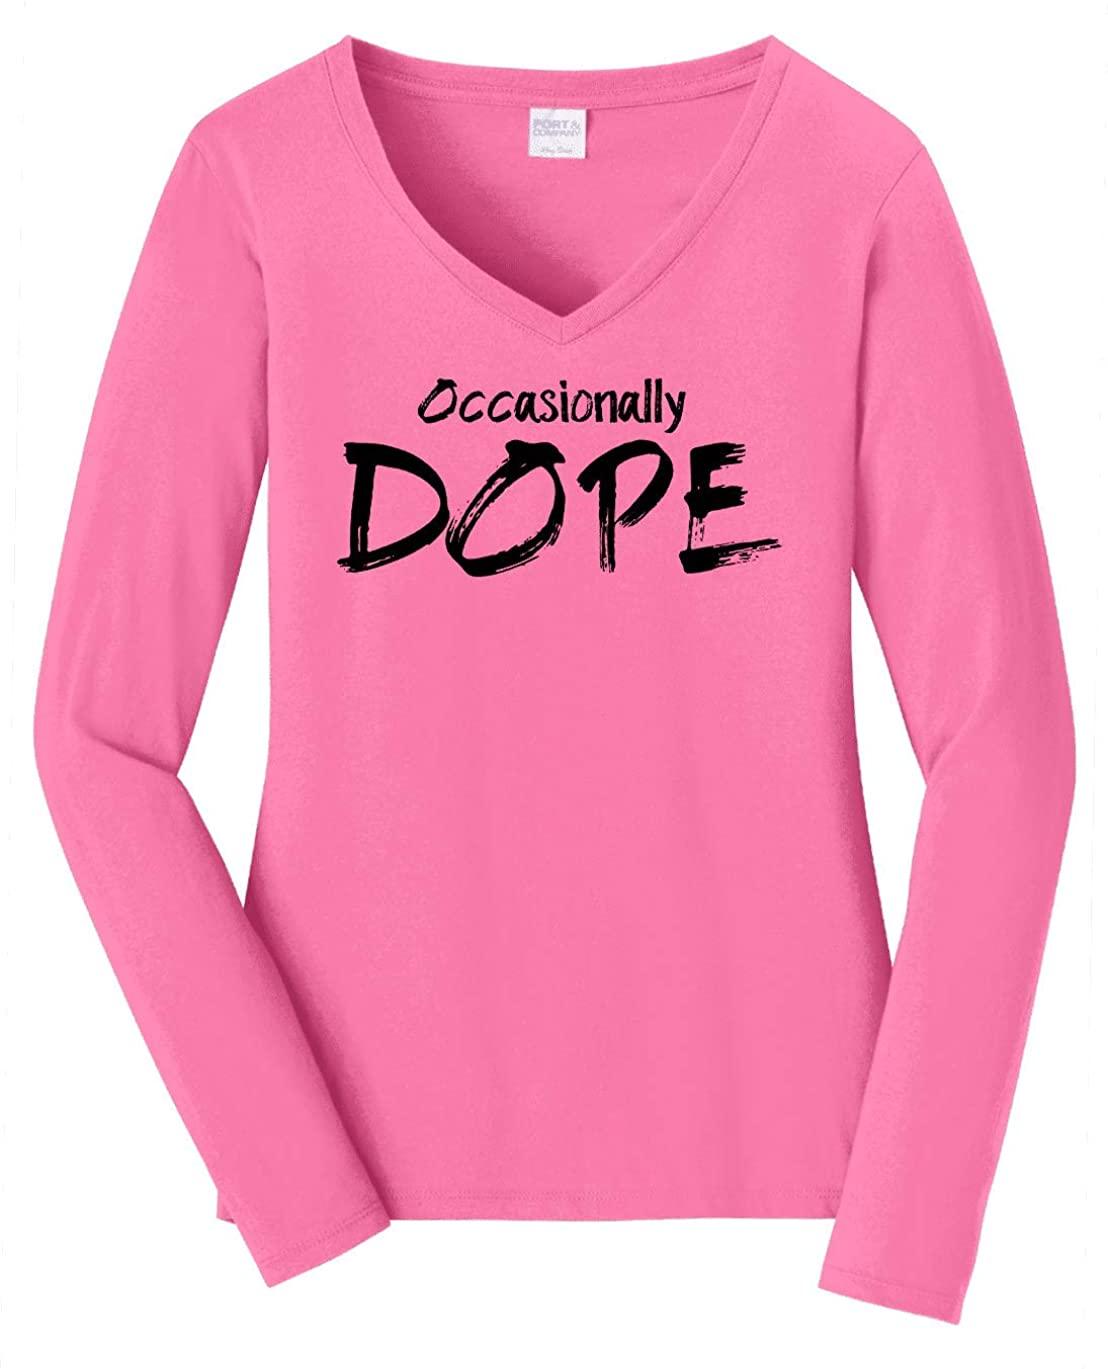 HARD EDGE DESIGN Women's Occasionally Dope Long Sleeve V Neck T-Shirt, 3X-Large, New Pink